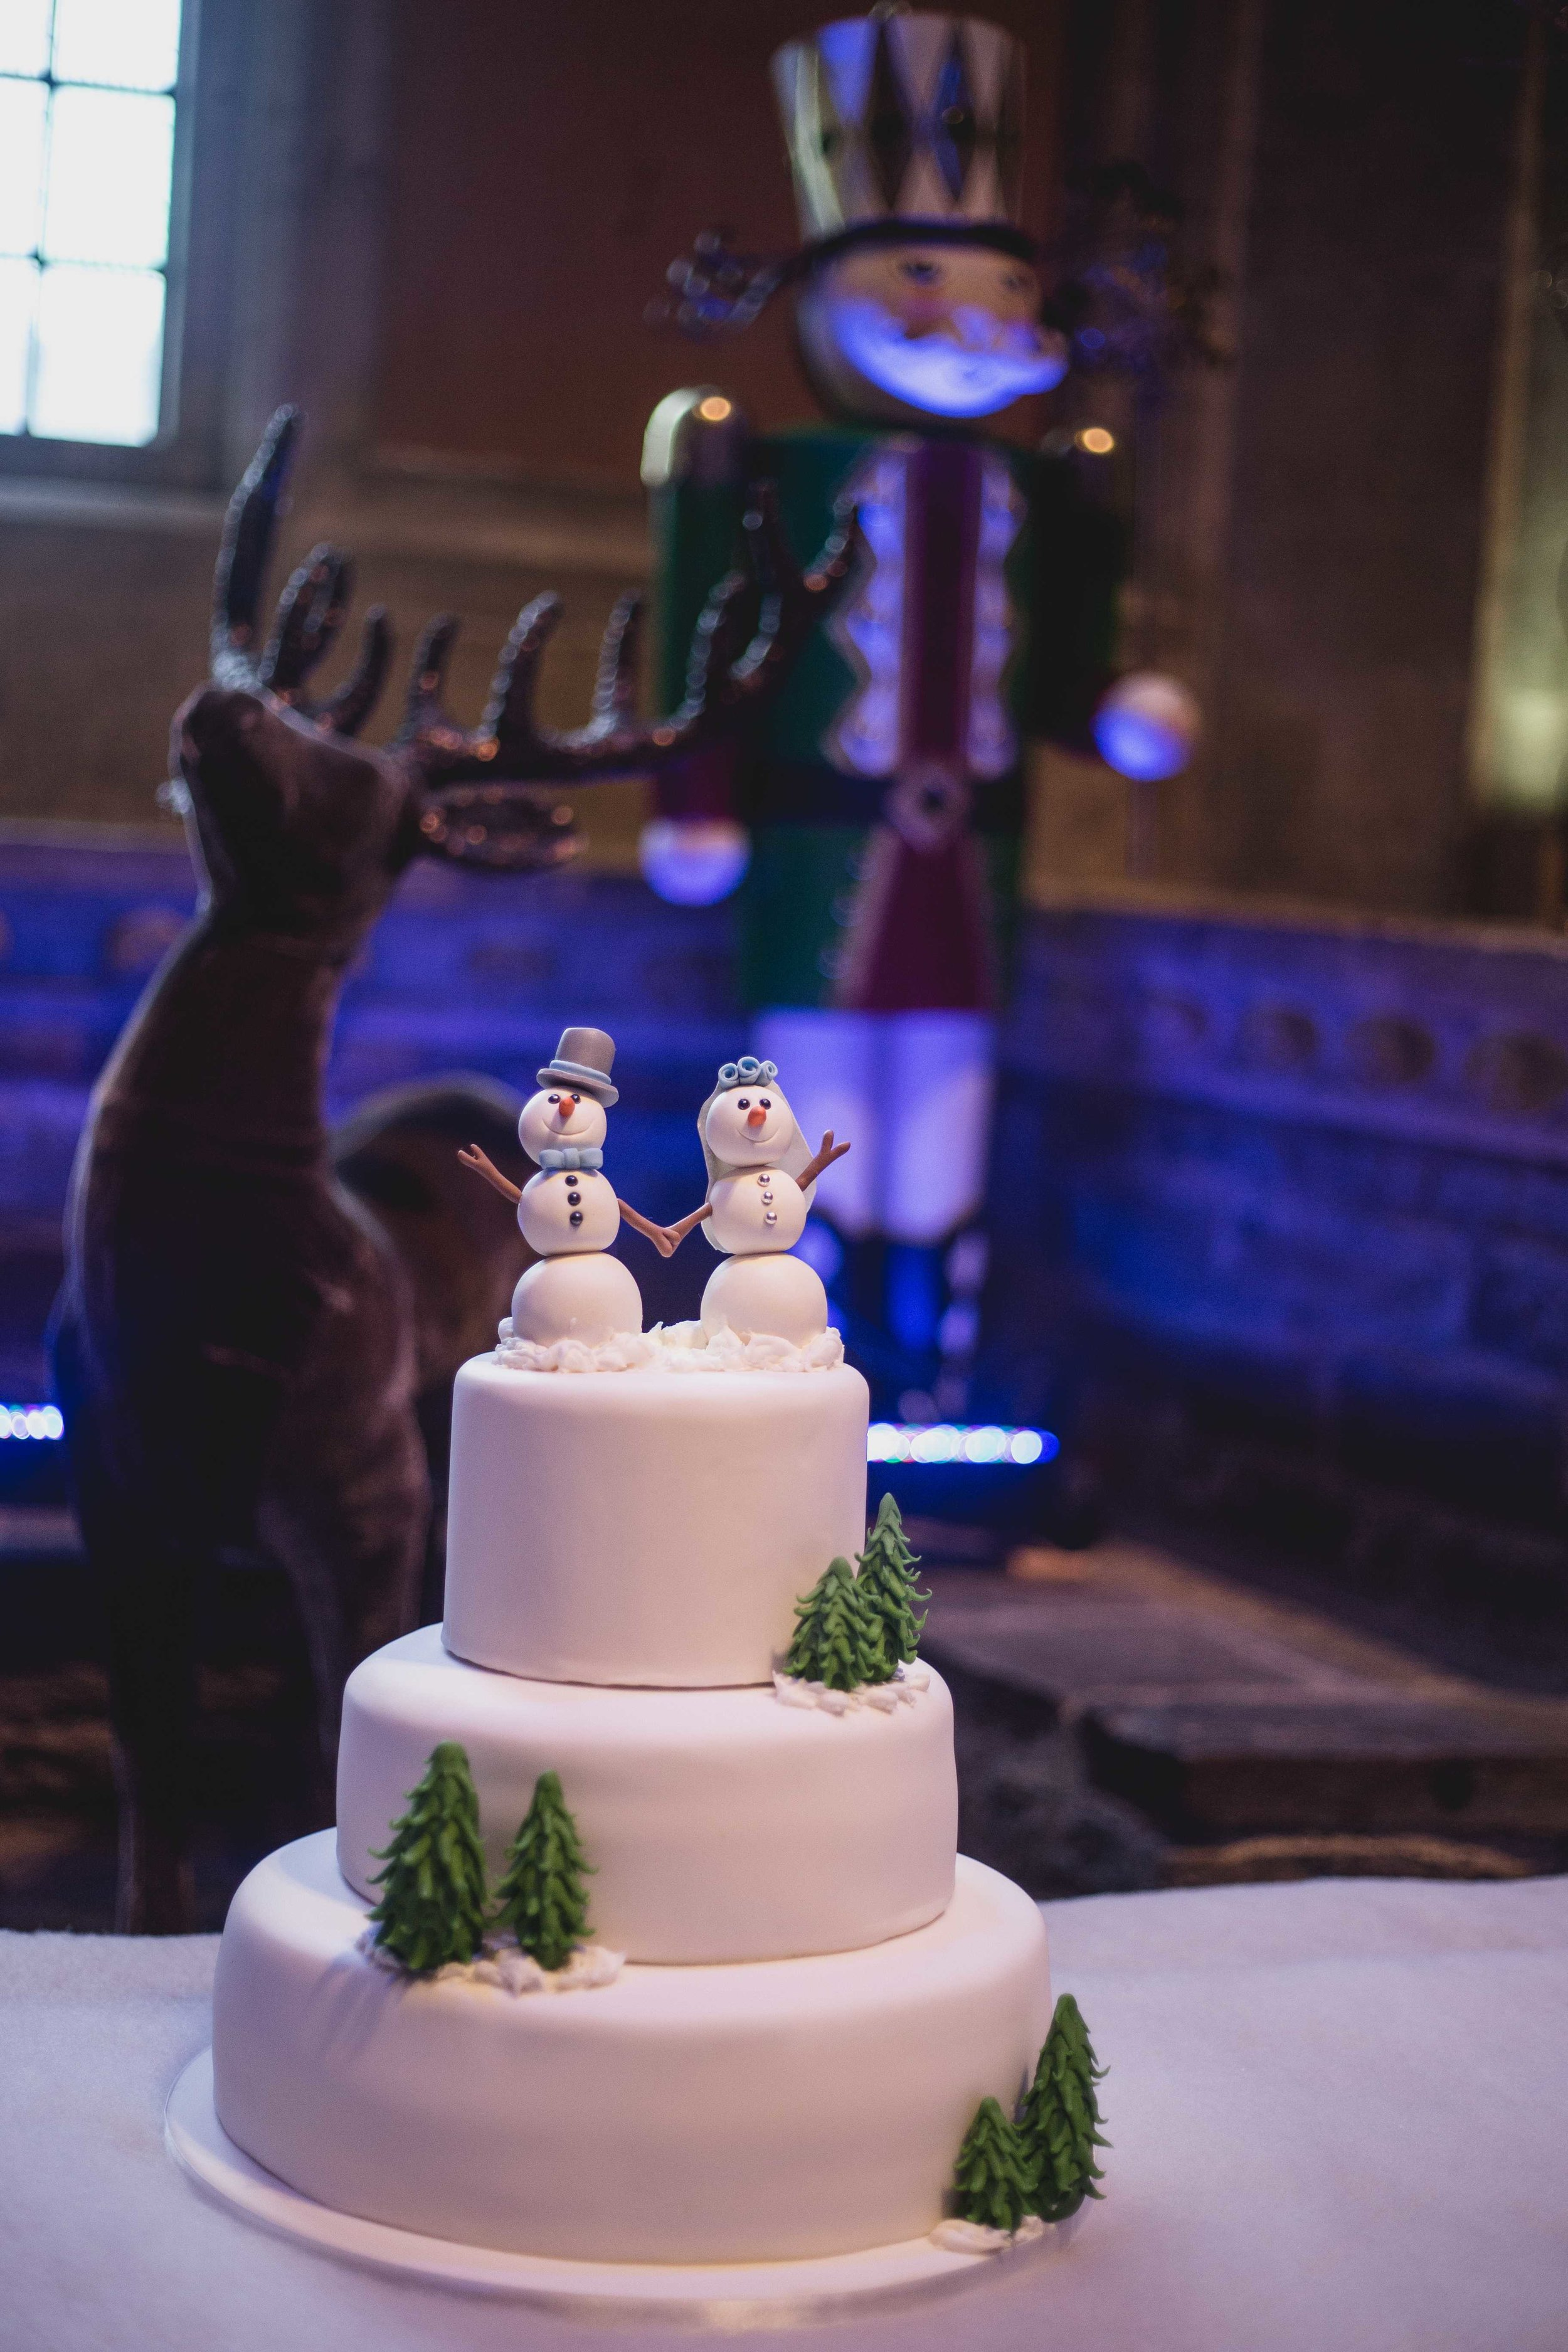 Close up image of a christmas themed wedding cake